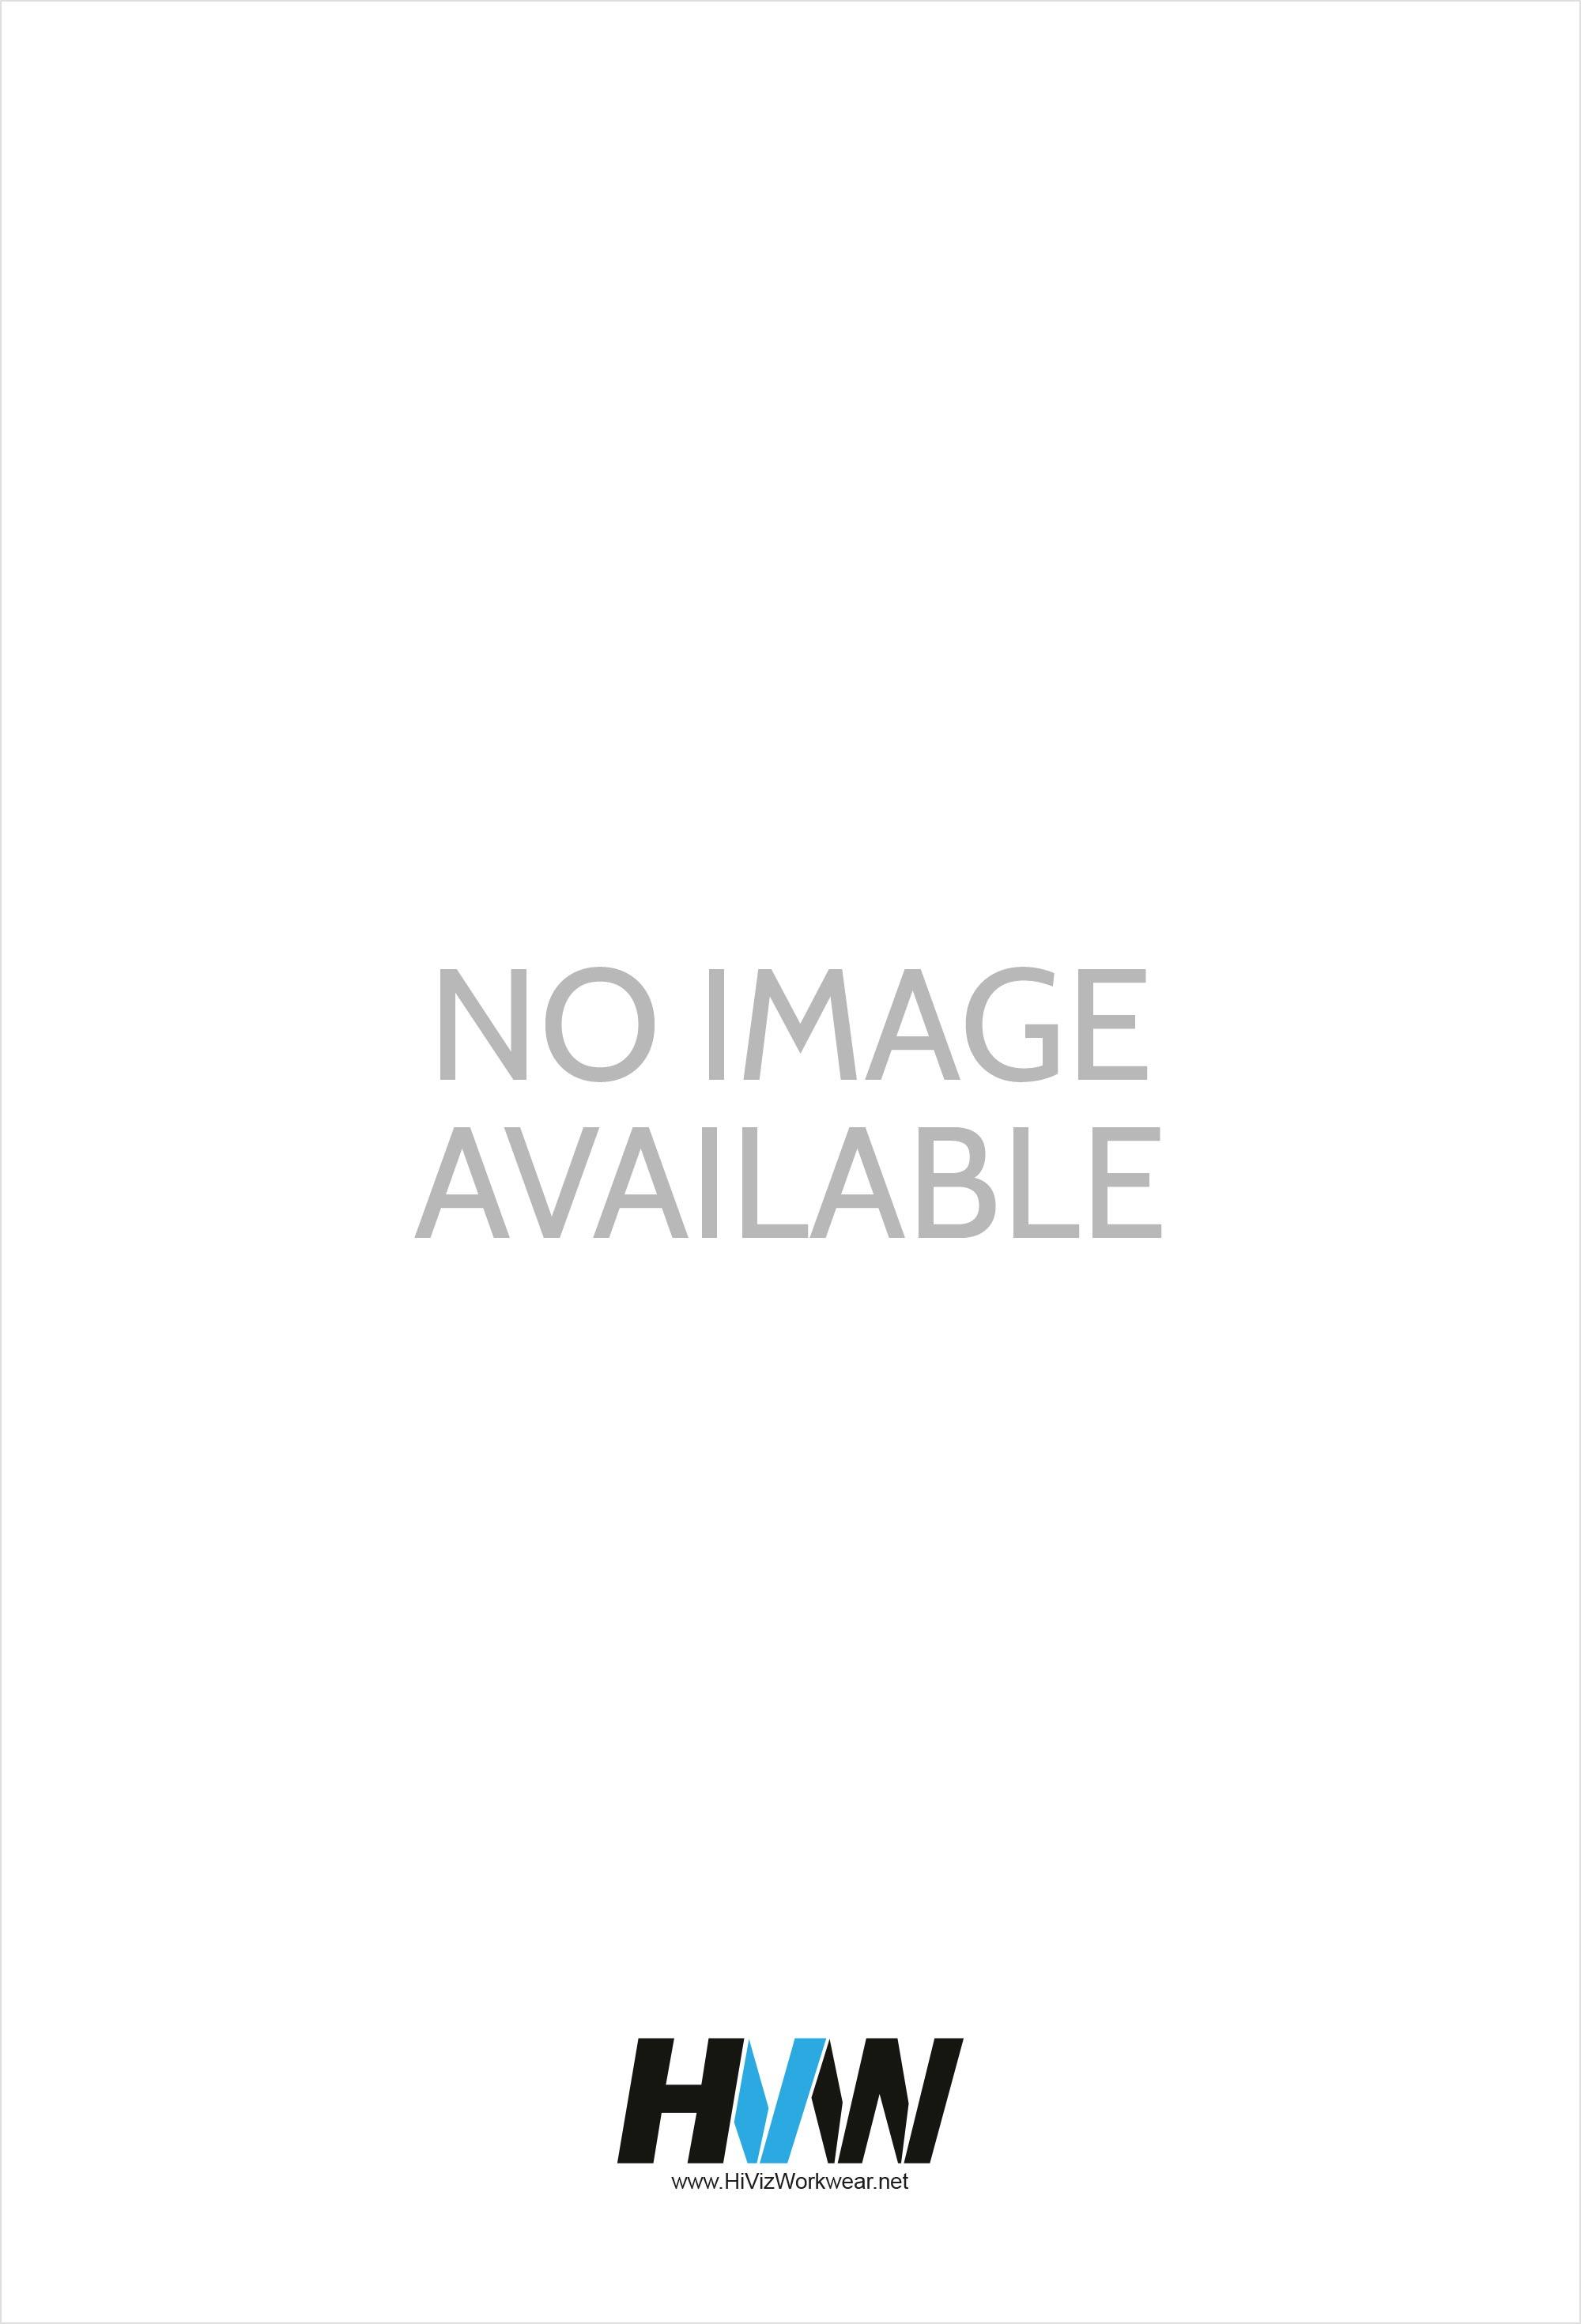 KK100 Workforce Short Sleeve Shirt  (S To 3XL)